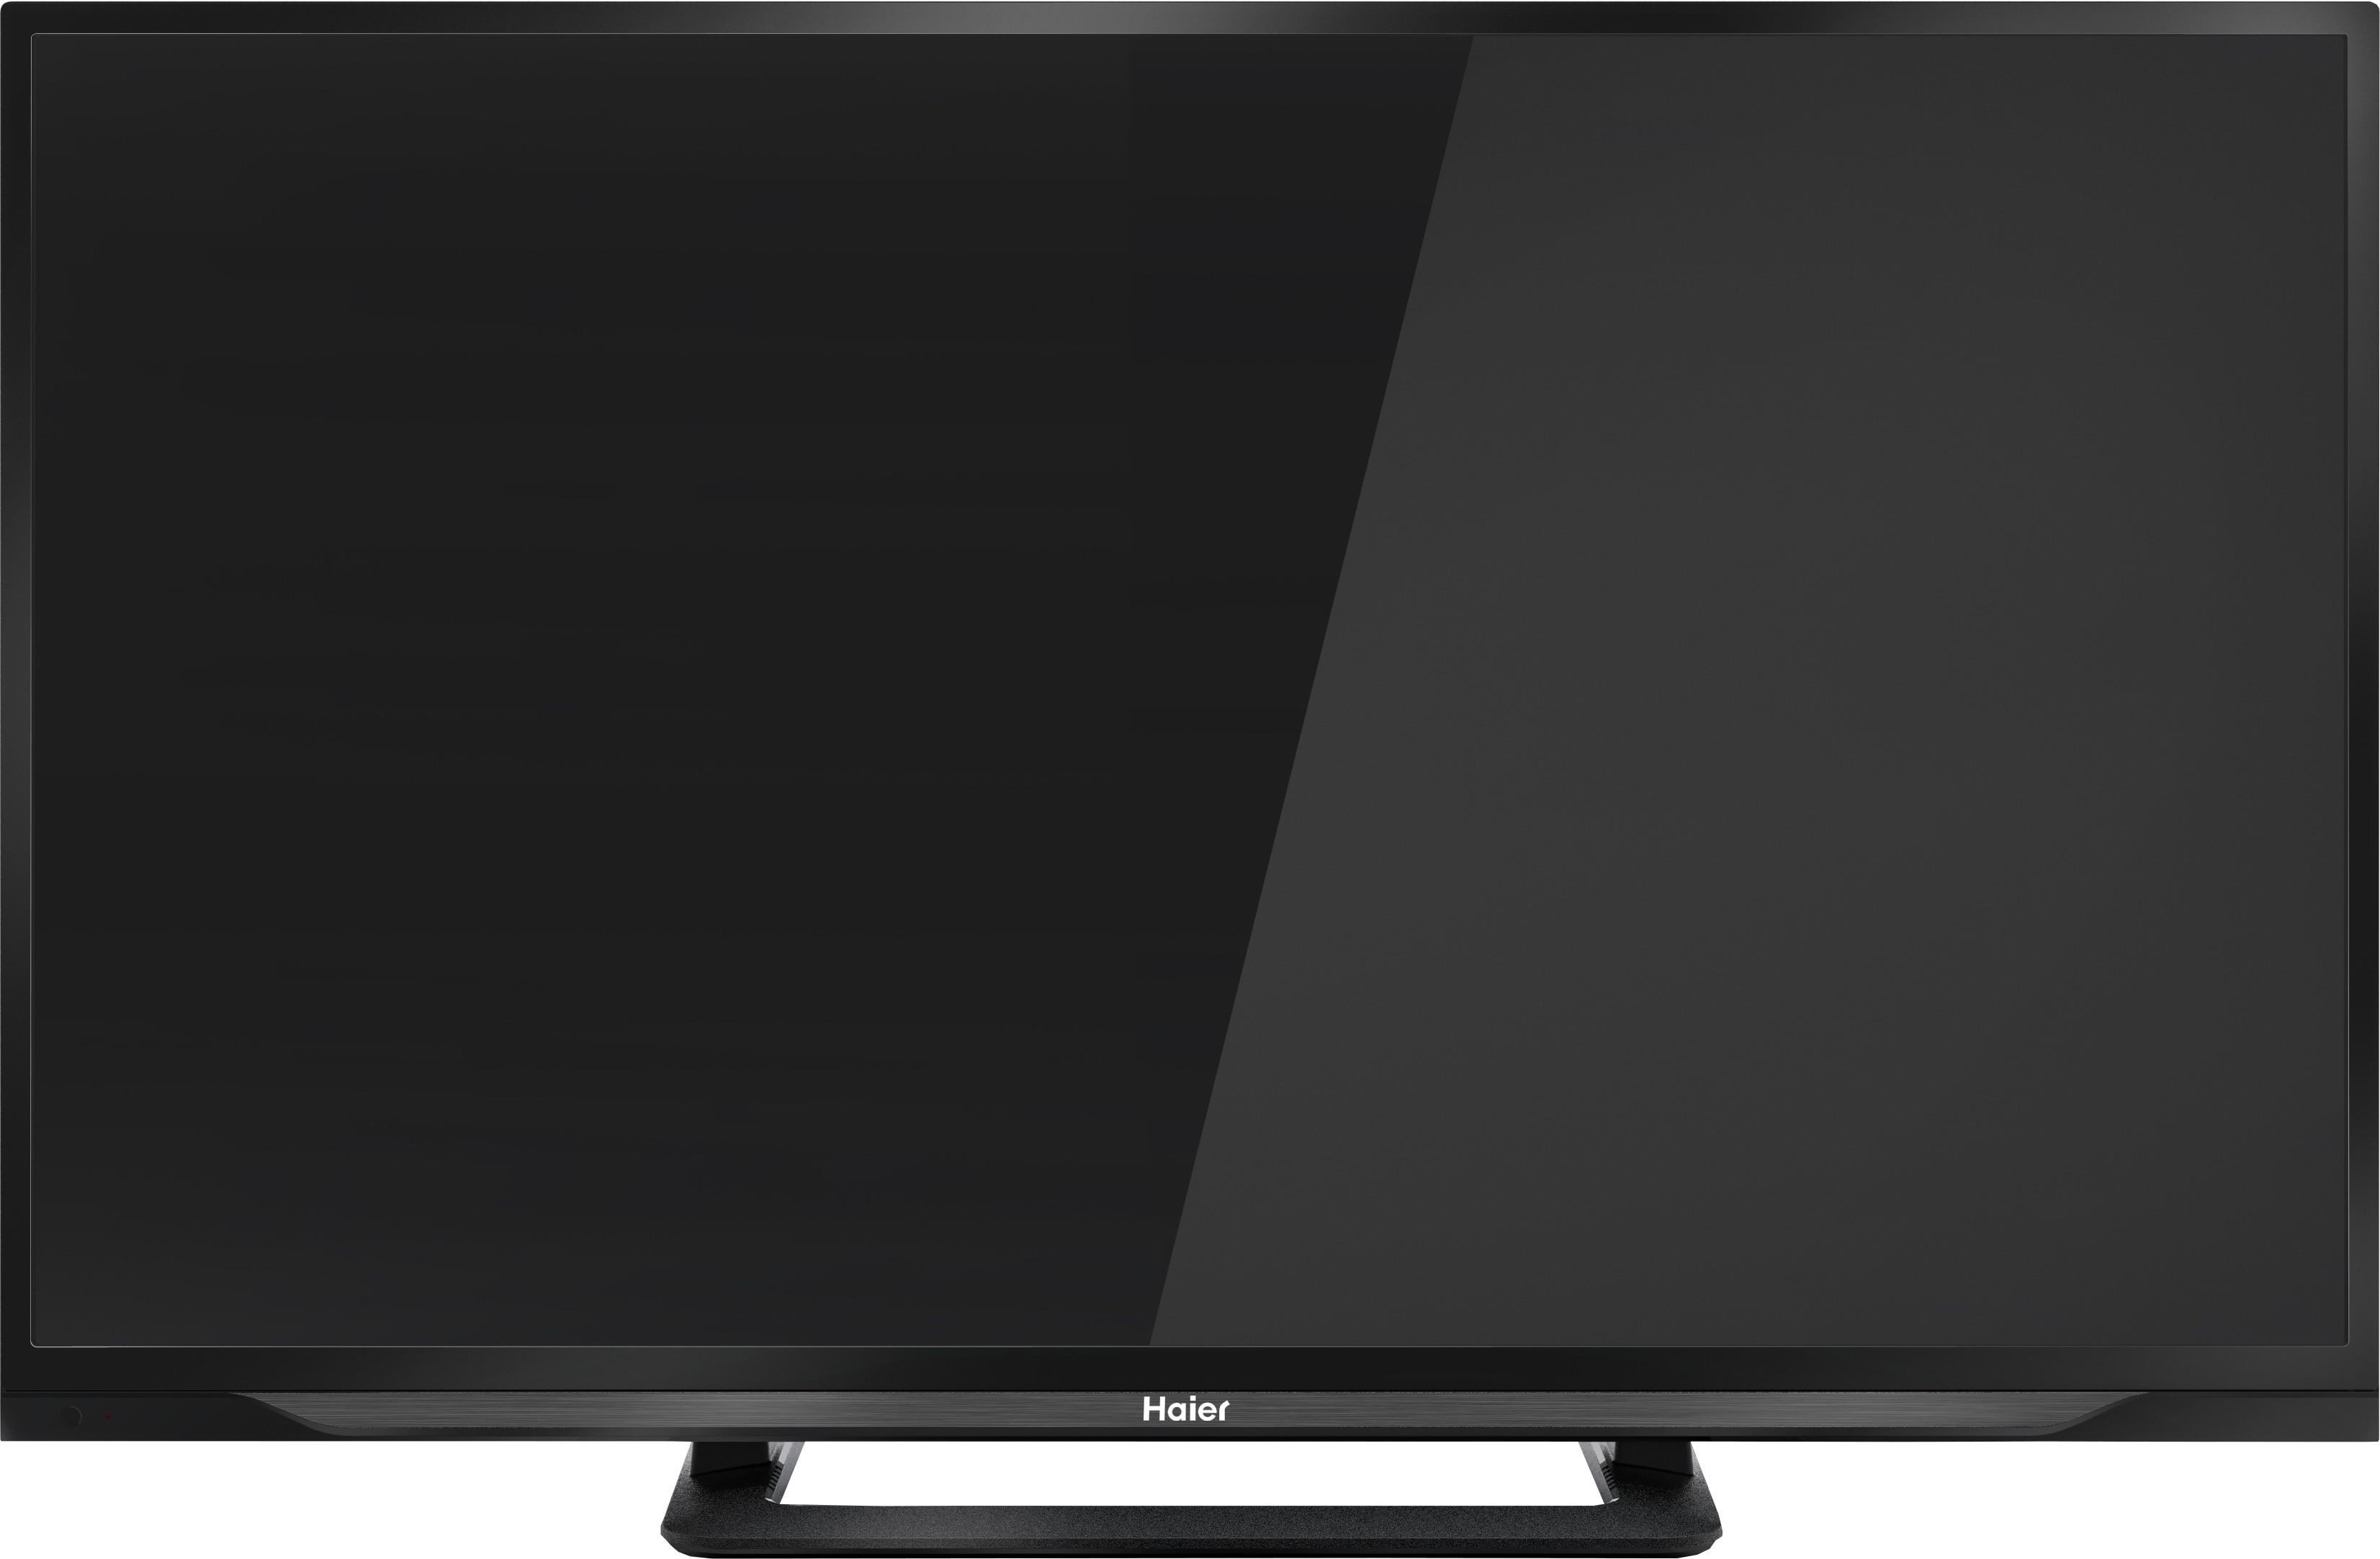 Haier LE32V600 81 cm (32) LED TV